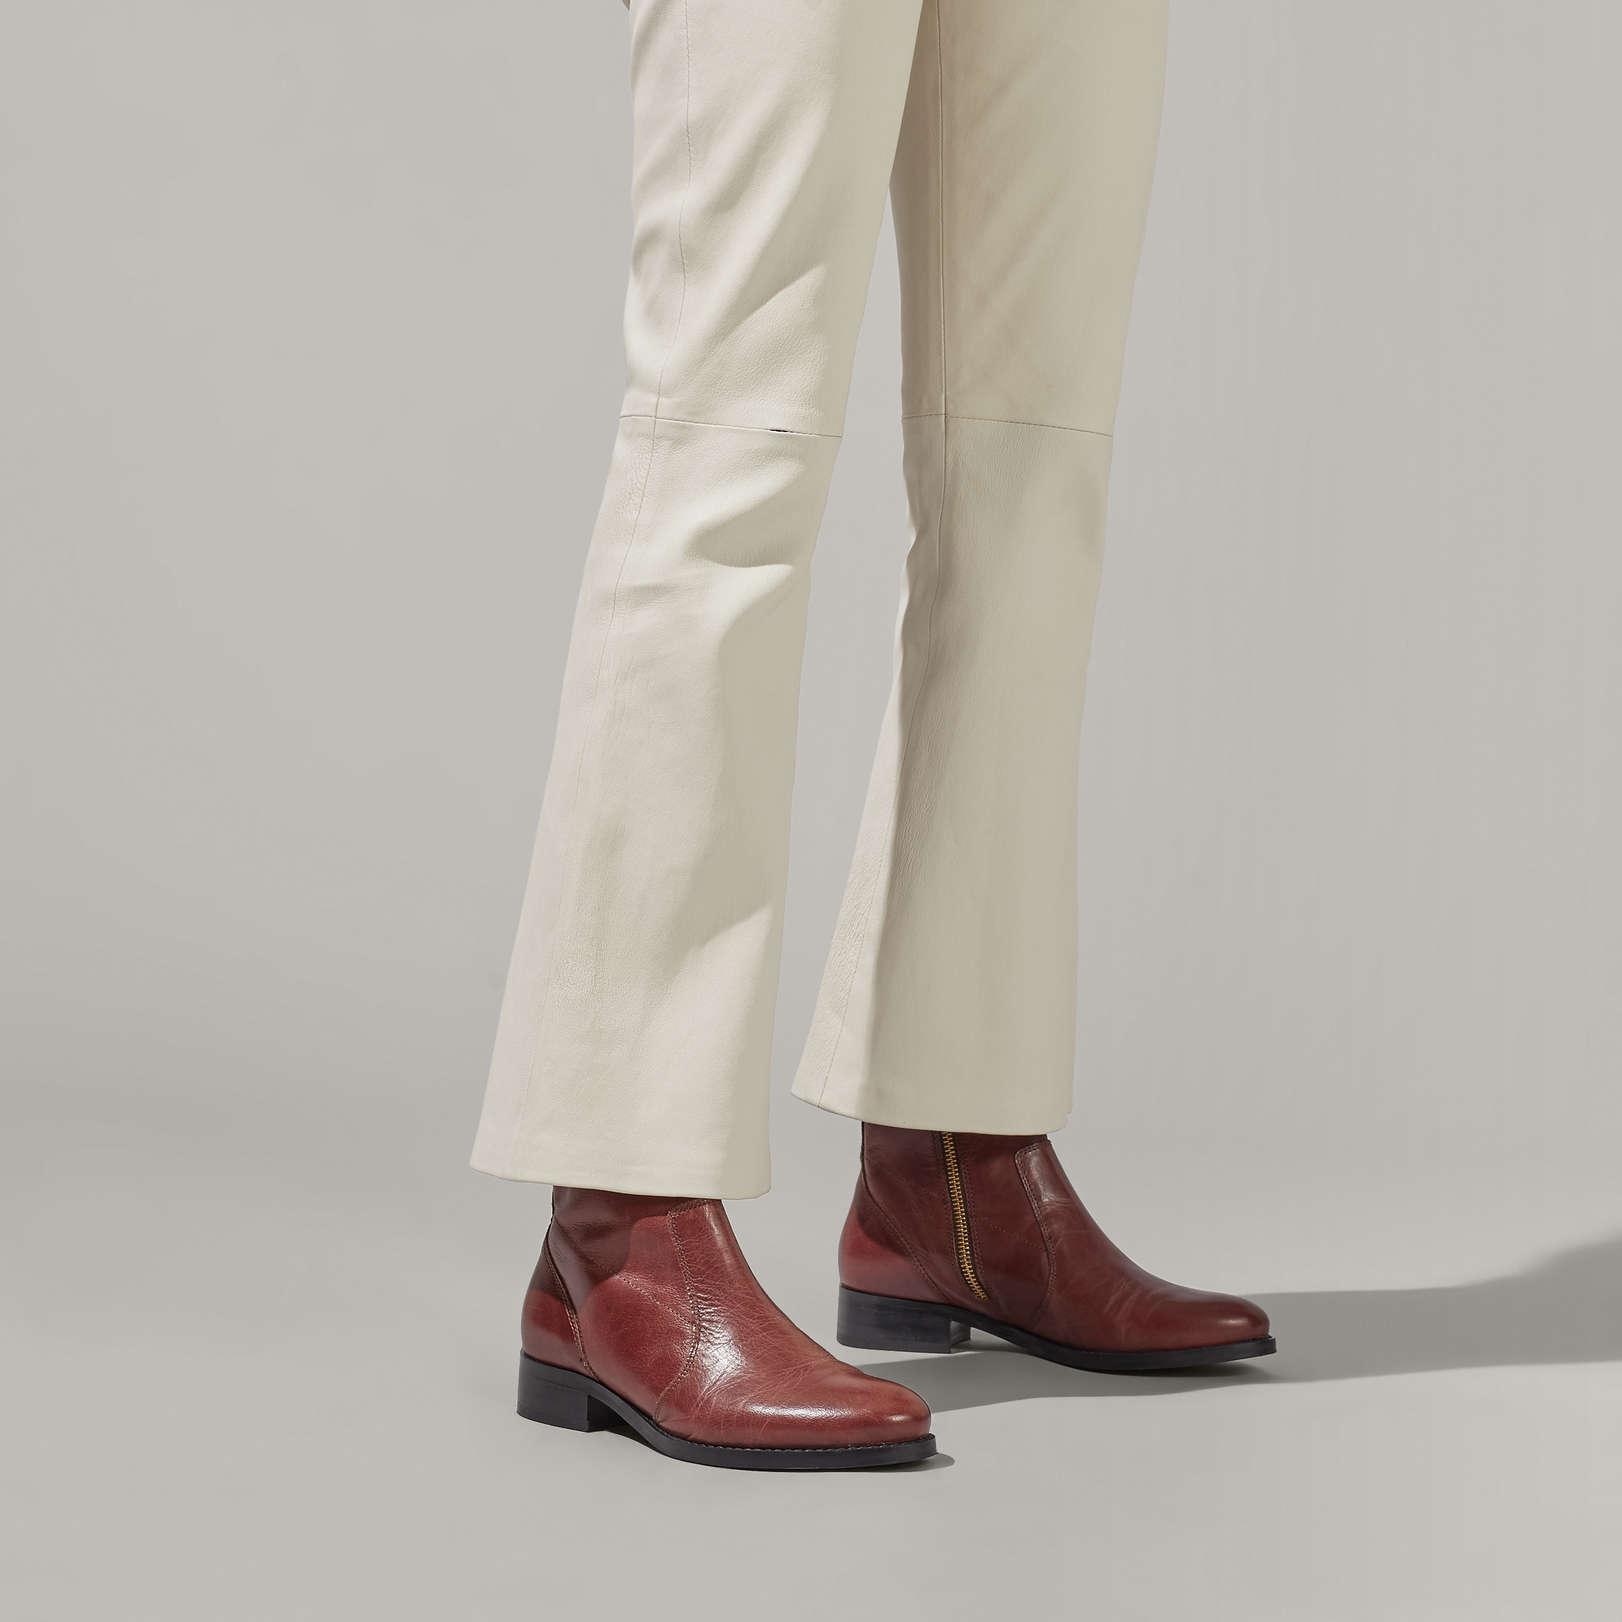 SAIL - CARVELA Ankle Boots